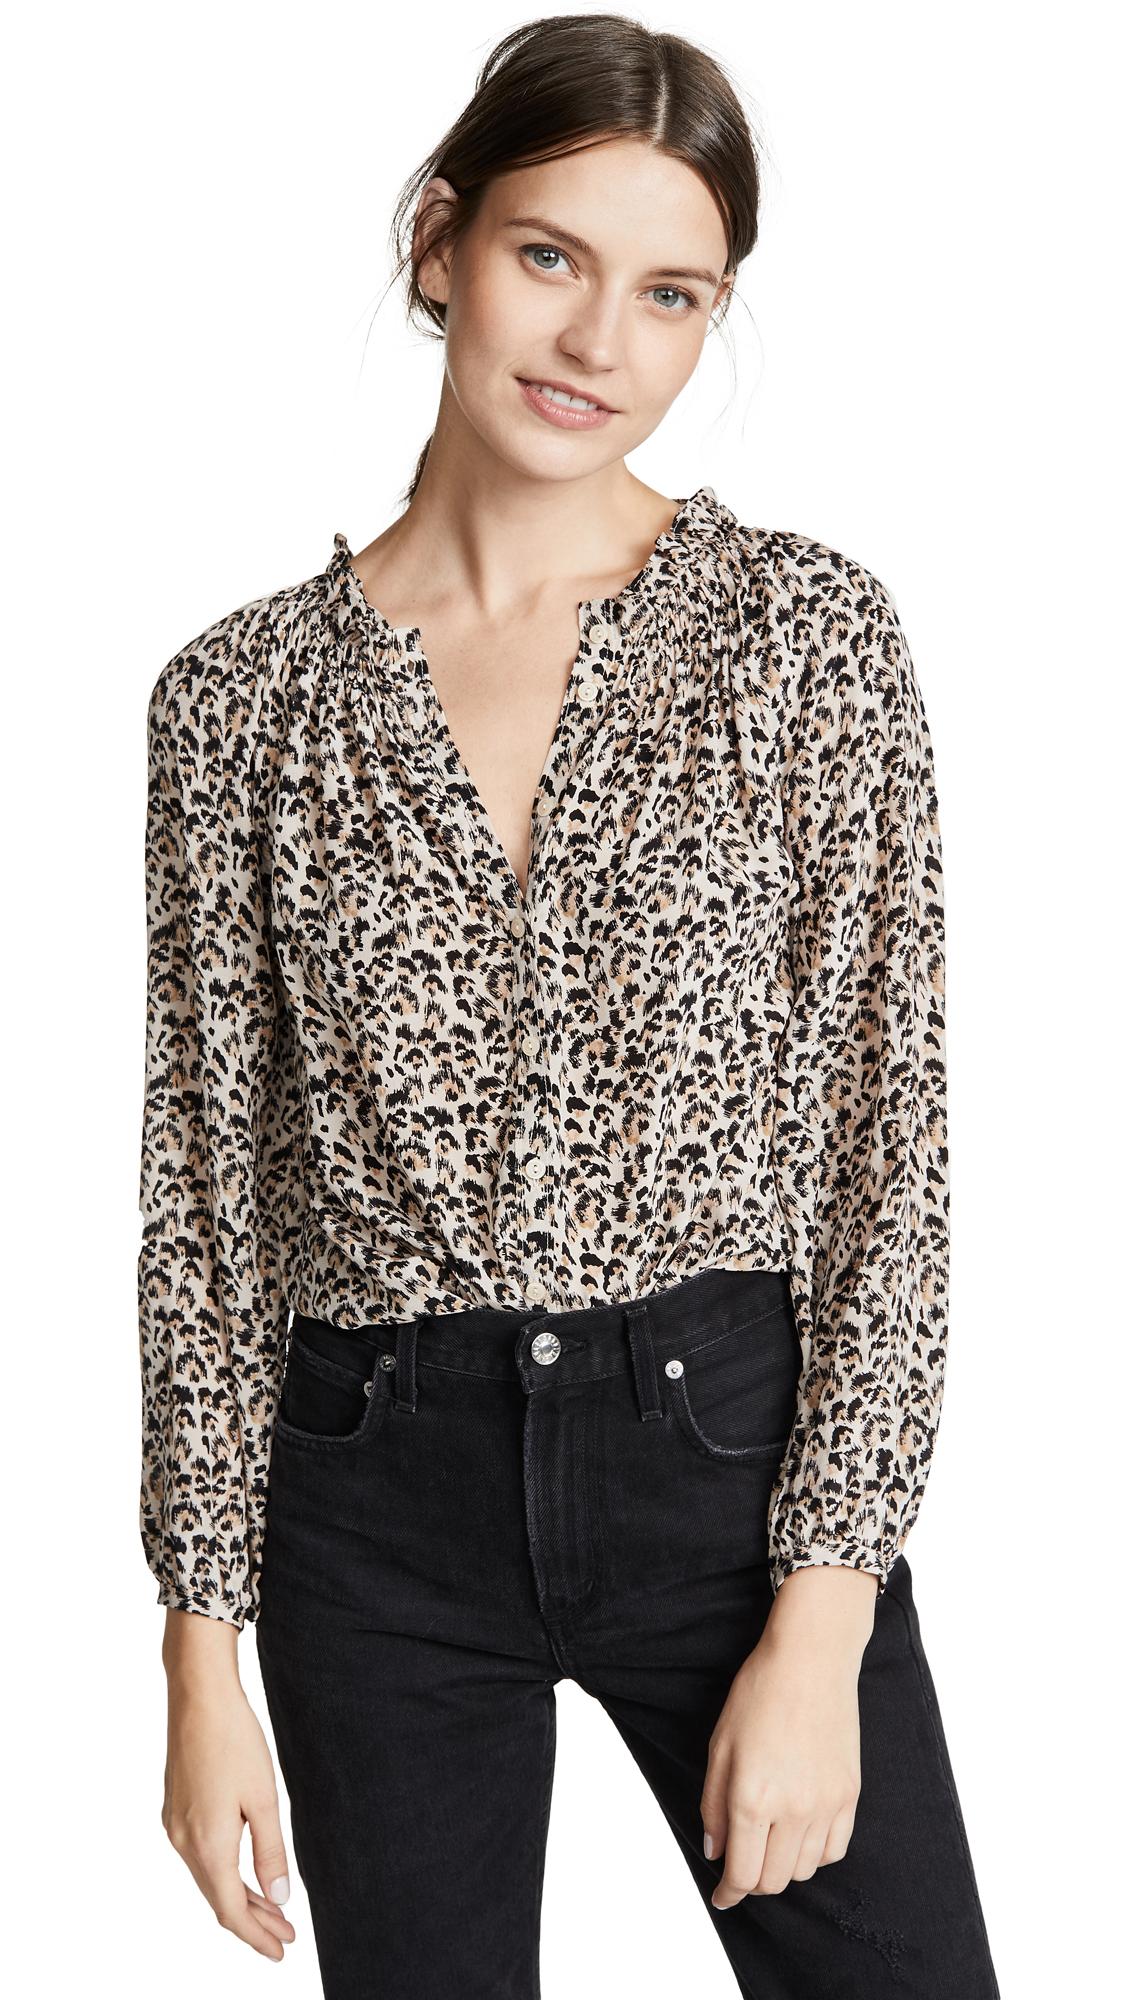 ded4292038c15 Rebecca Taylor Long Sleeve Leopard Top